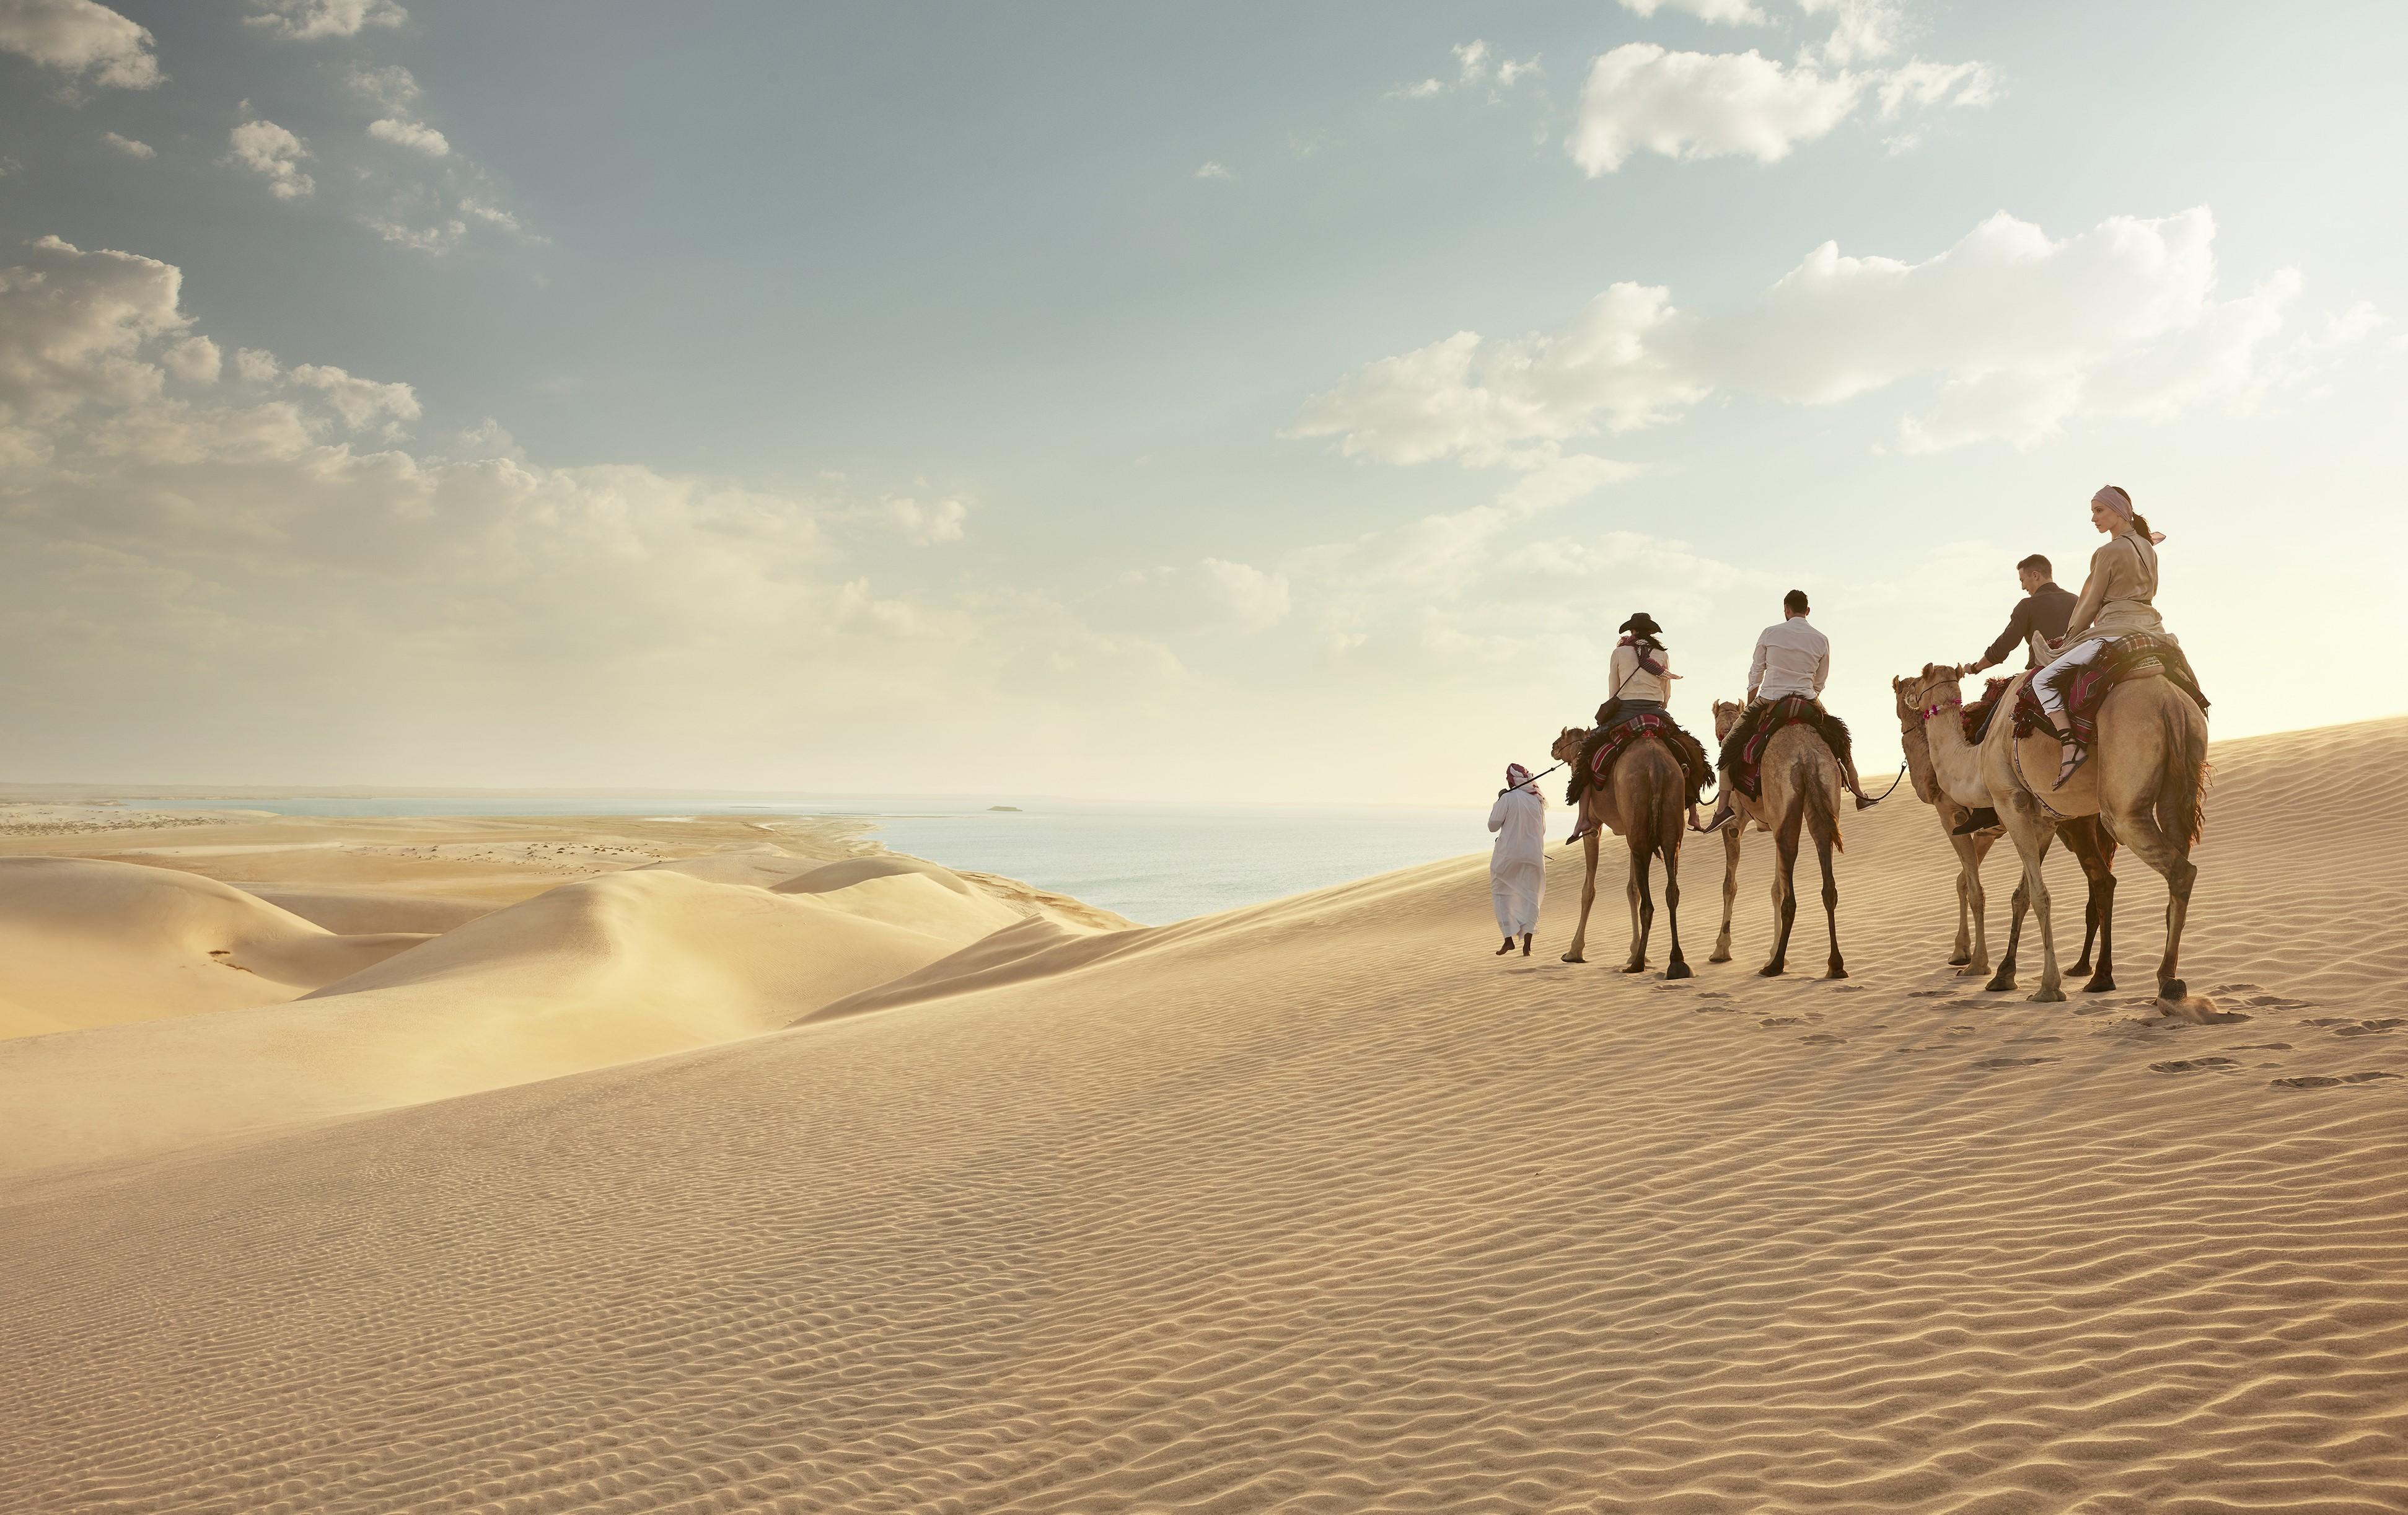 The desert | Visit Qatar